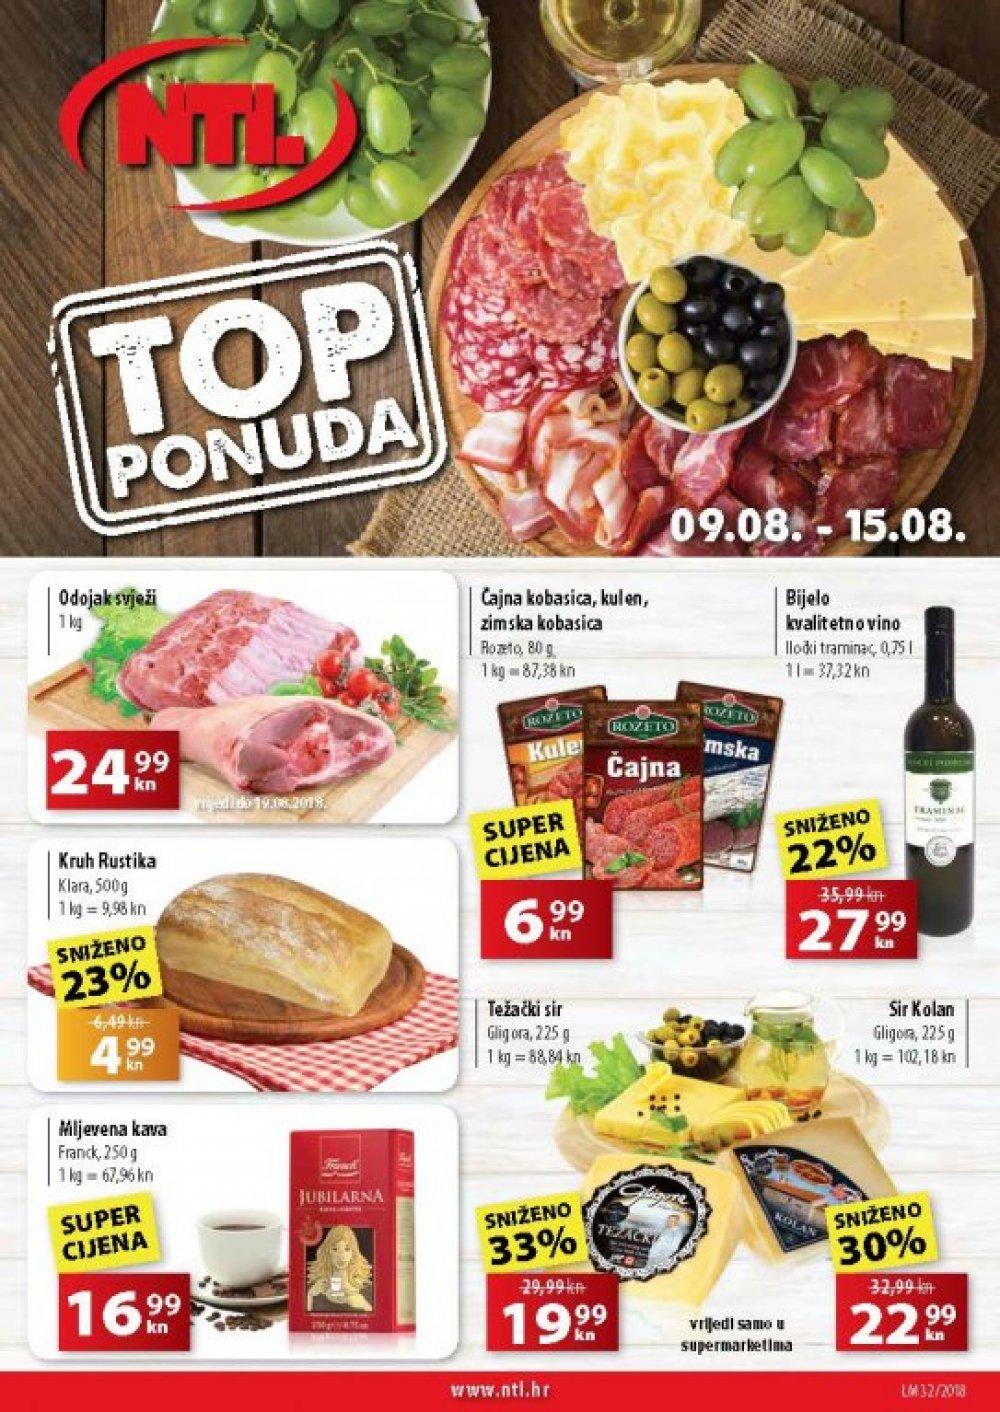 NTL katalog Akcija Zapad Supermarketi od 09.08. do 15.08.2018.